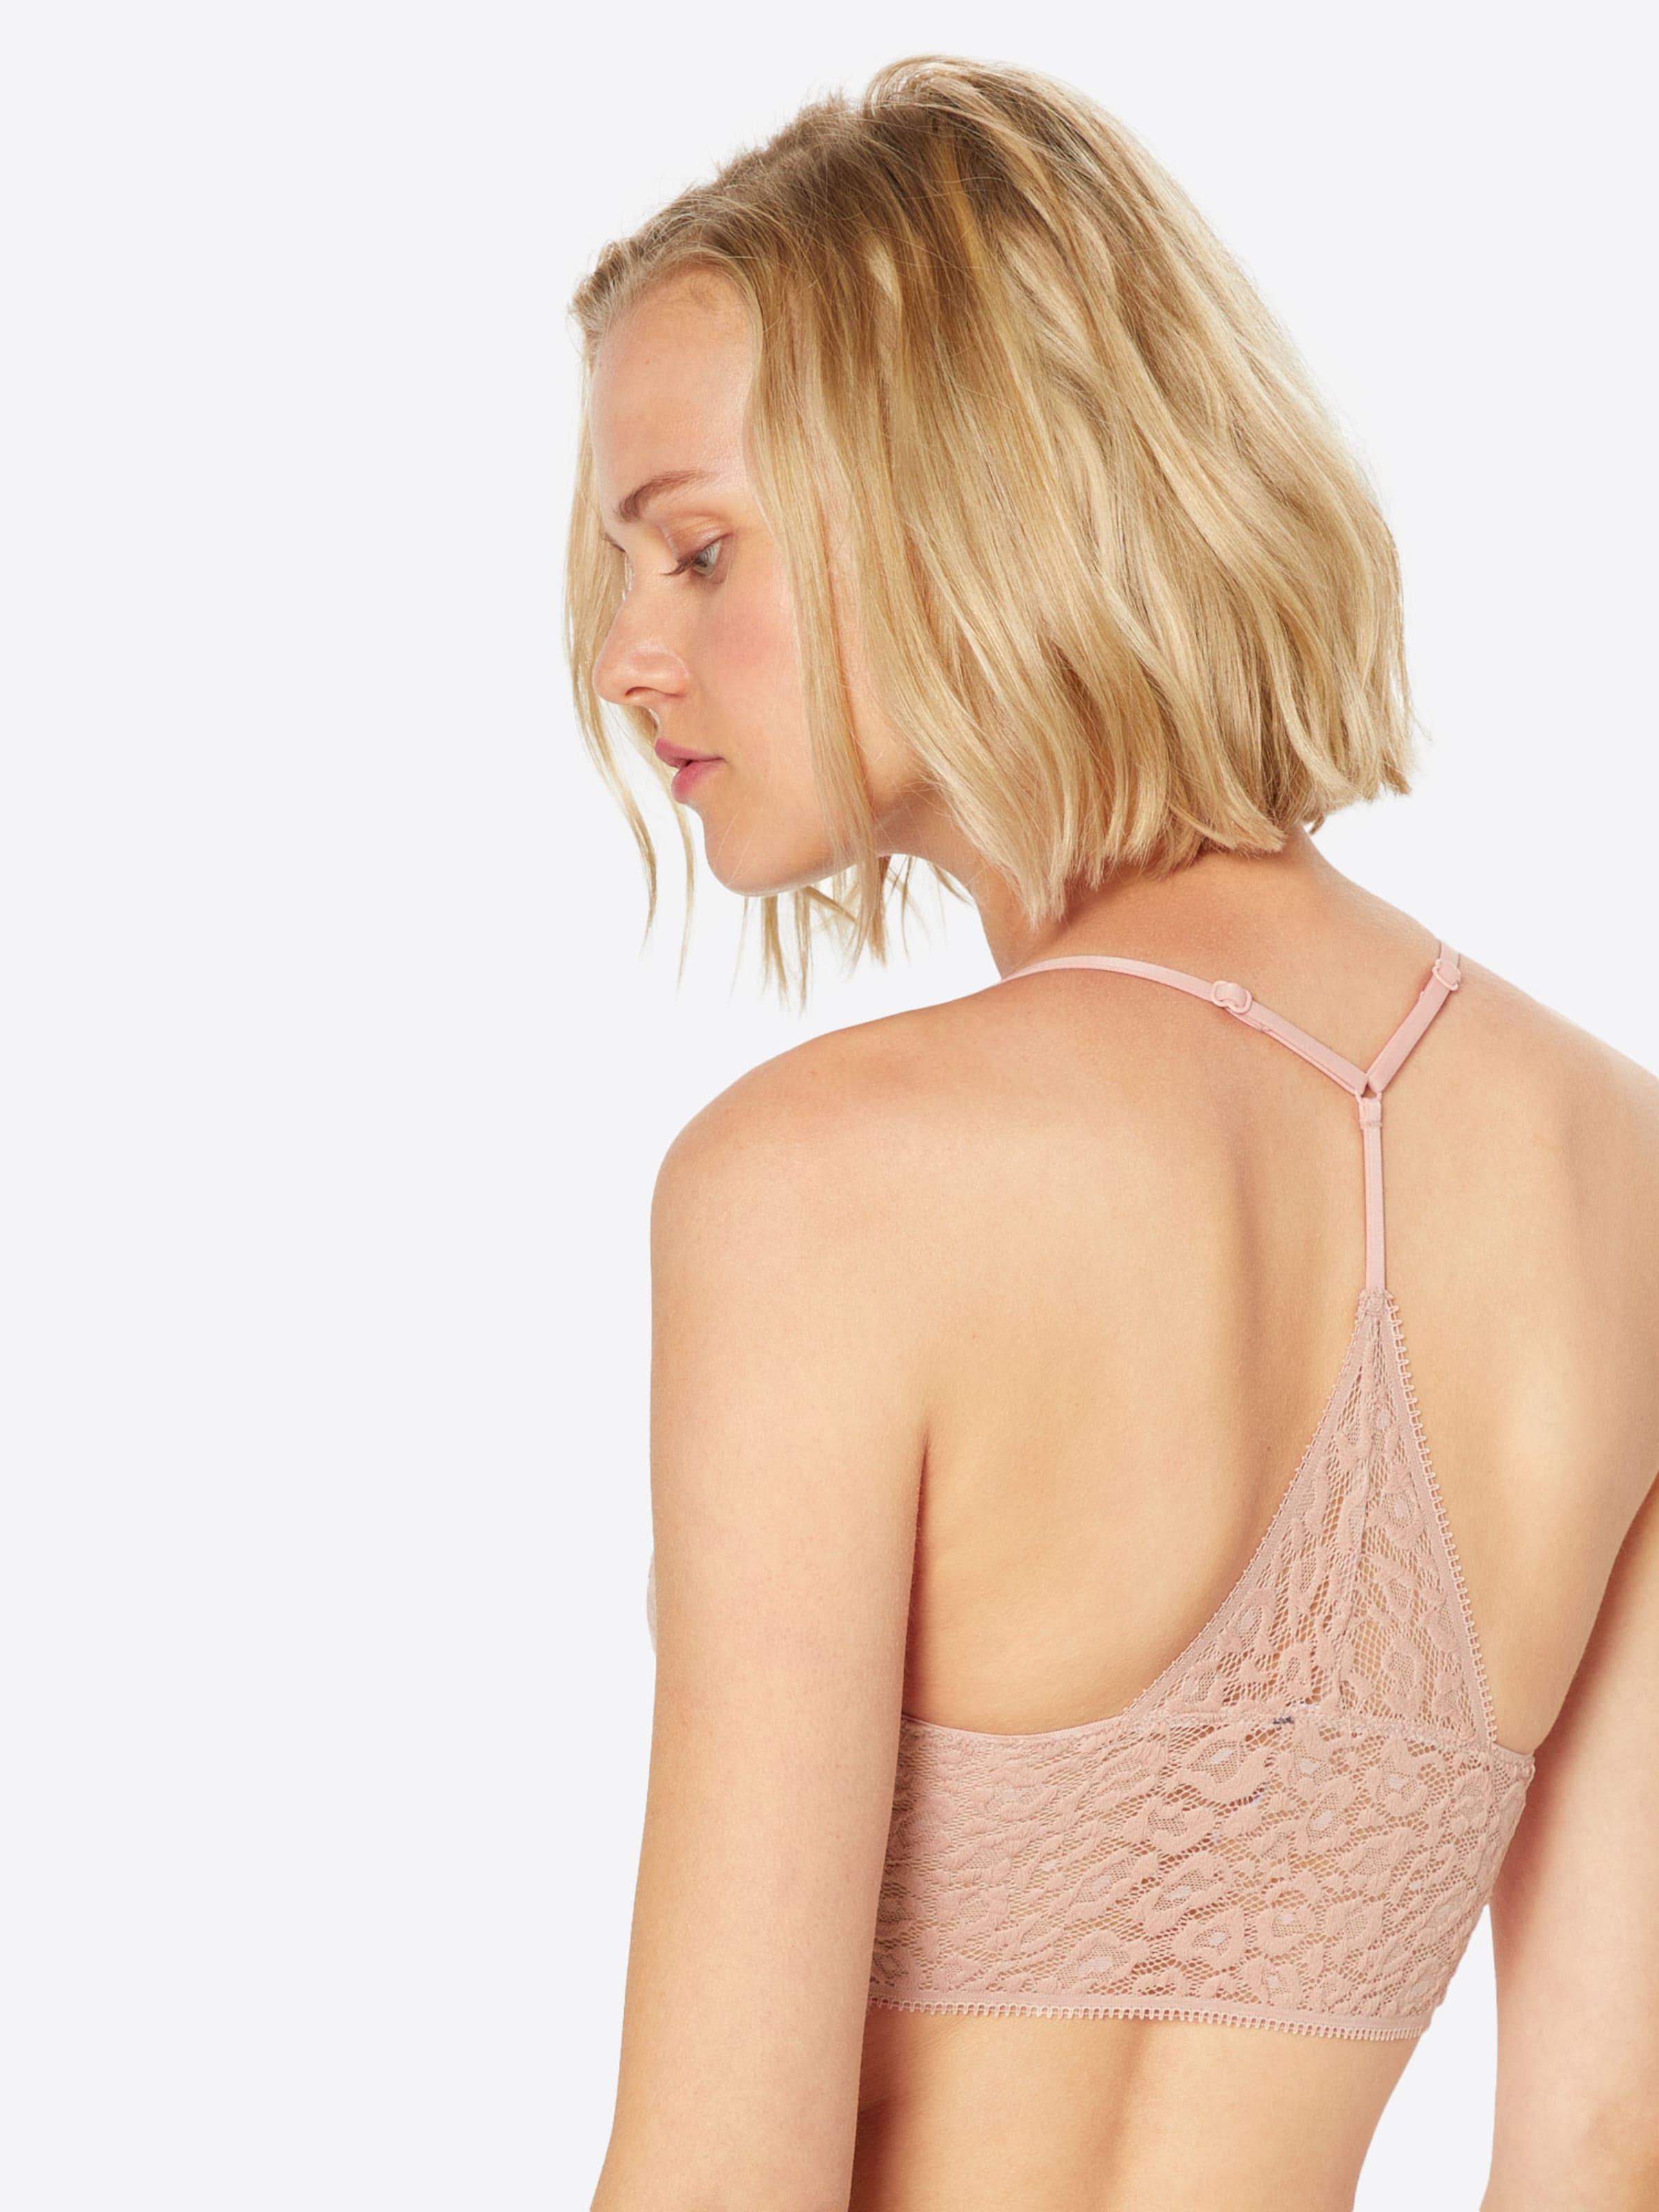 Skiny Bustier Rosé In 'paradise' Rosé Bustier Bustier 'paradise' In Skiny In 'paradise' Skiny qSUVpGzM